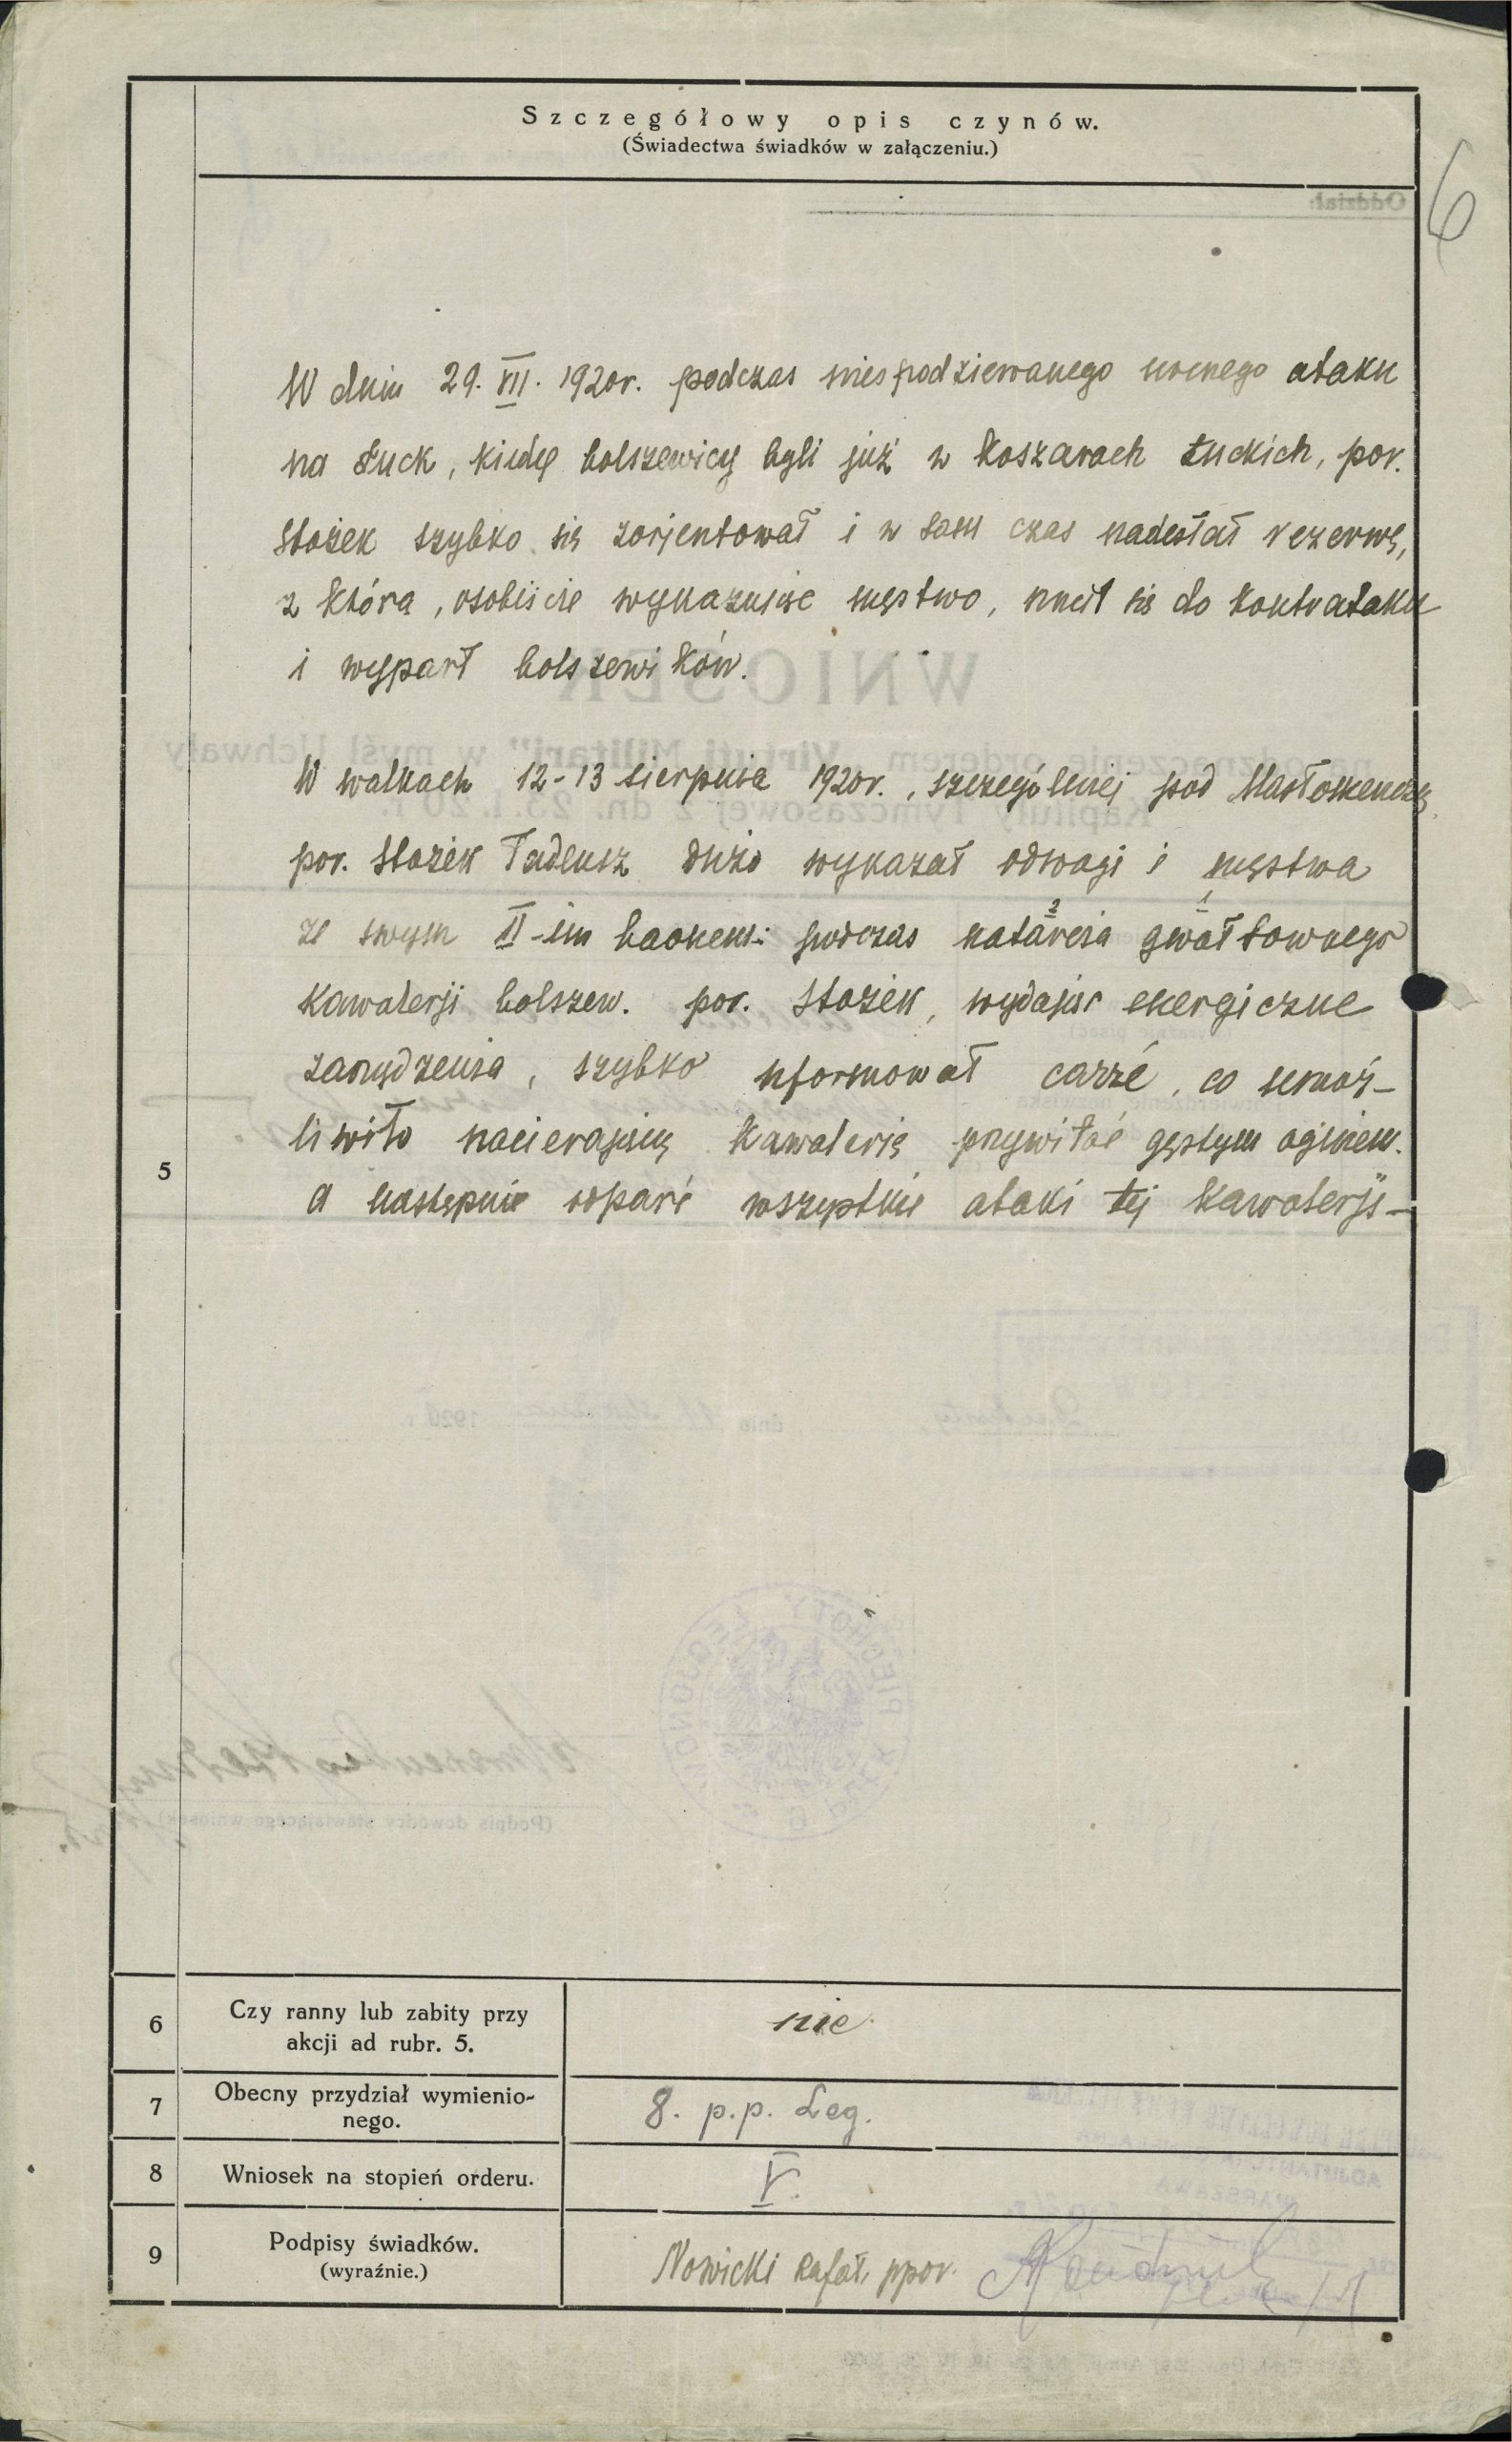 Wniosek o odznaczenie orderem Virtuti Militari